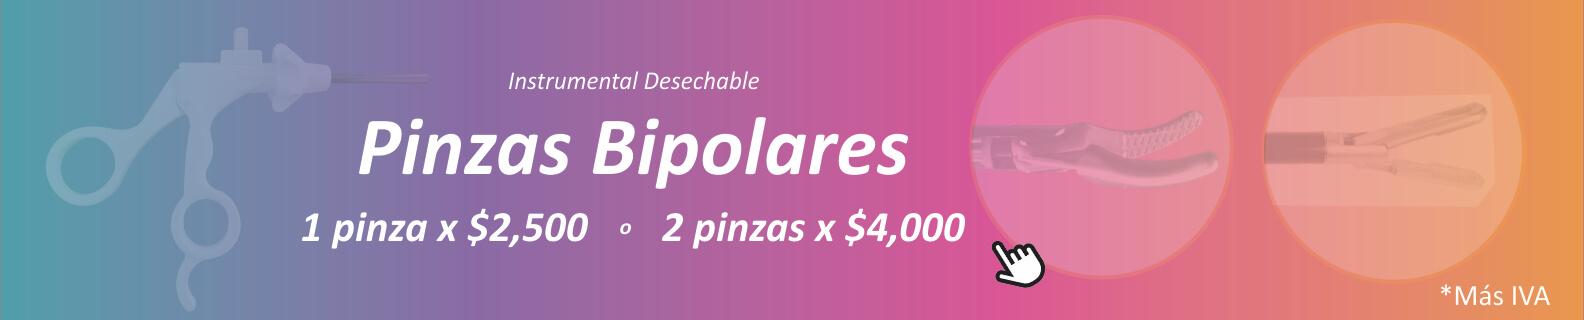 pinzas-bipolares-promocion